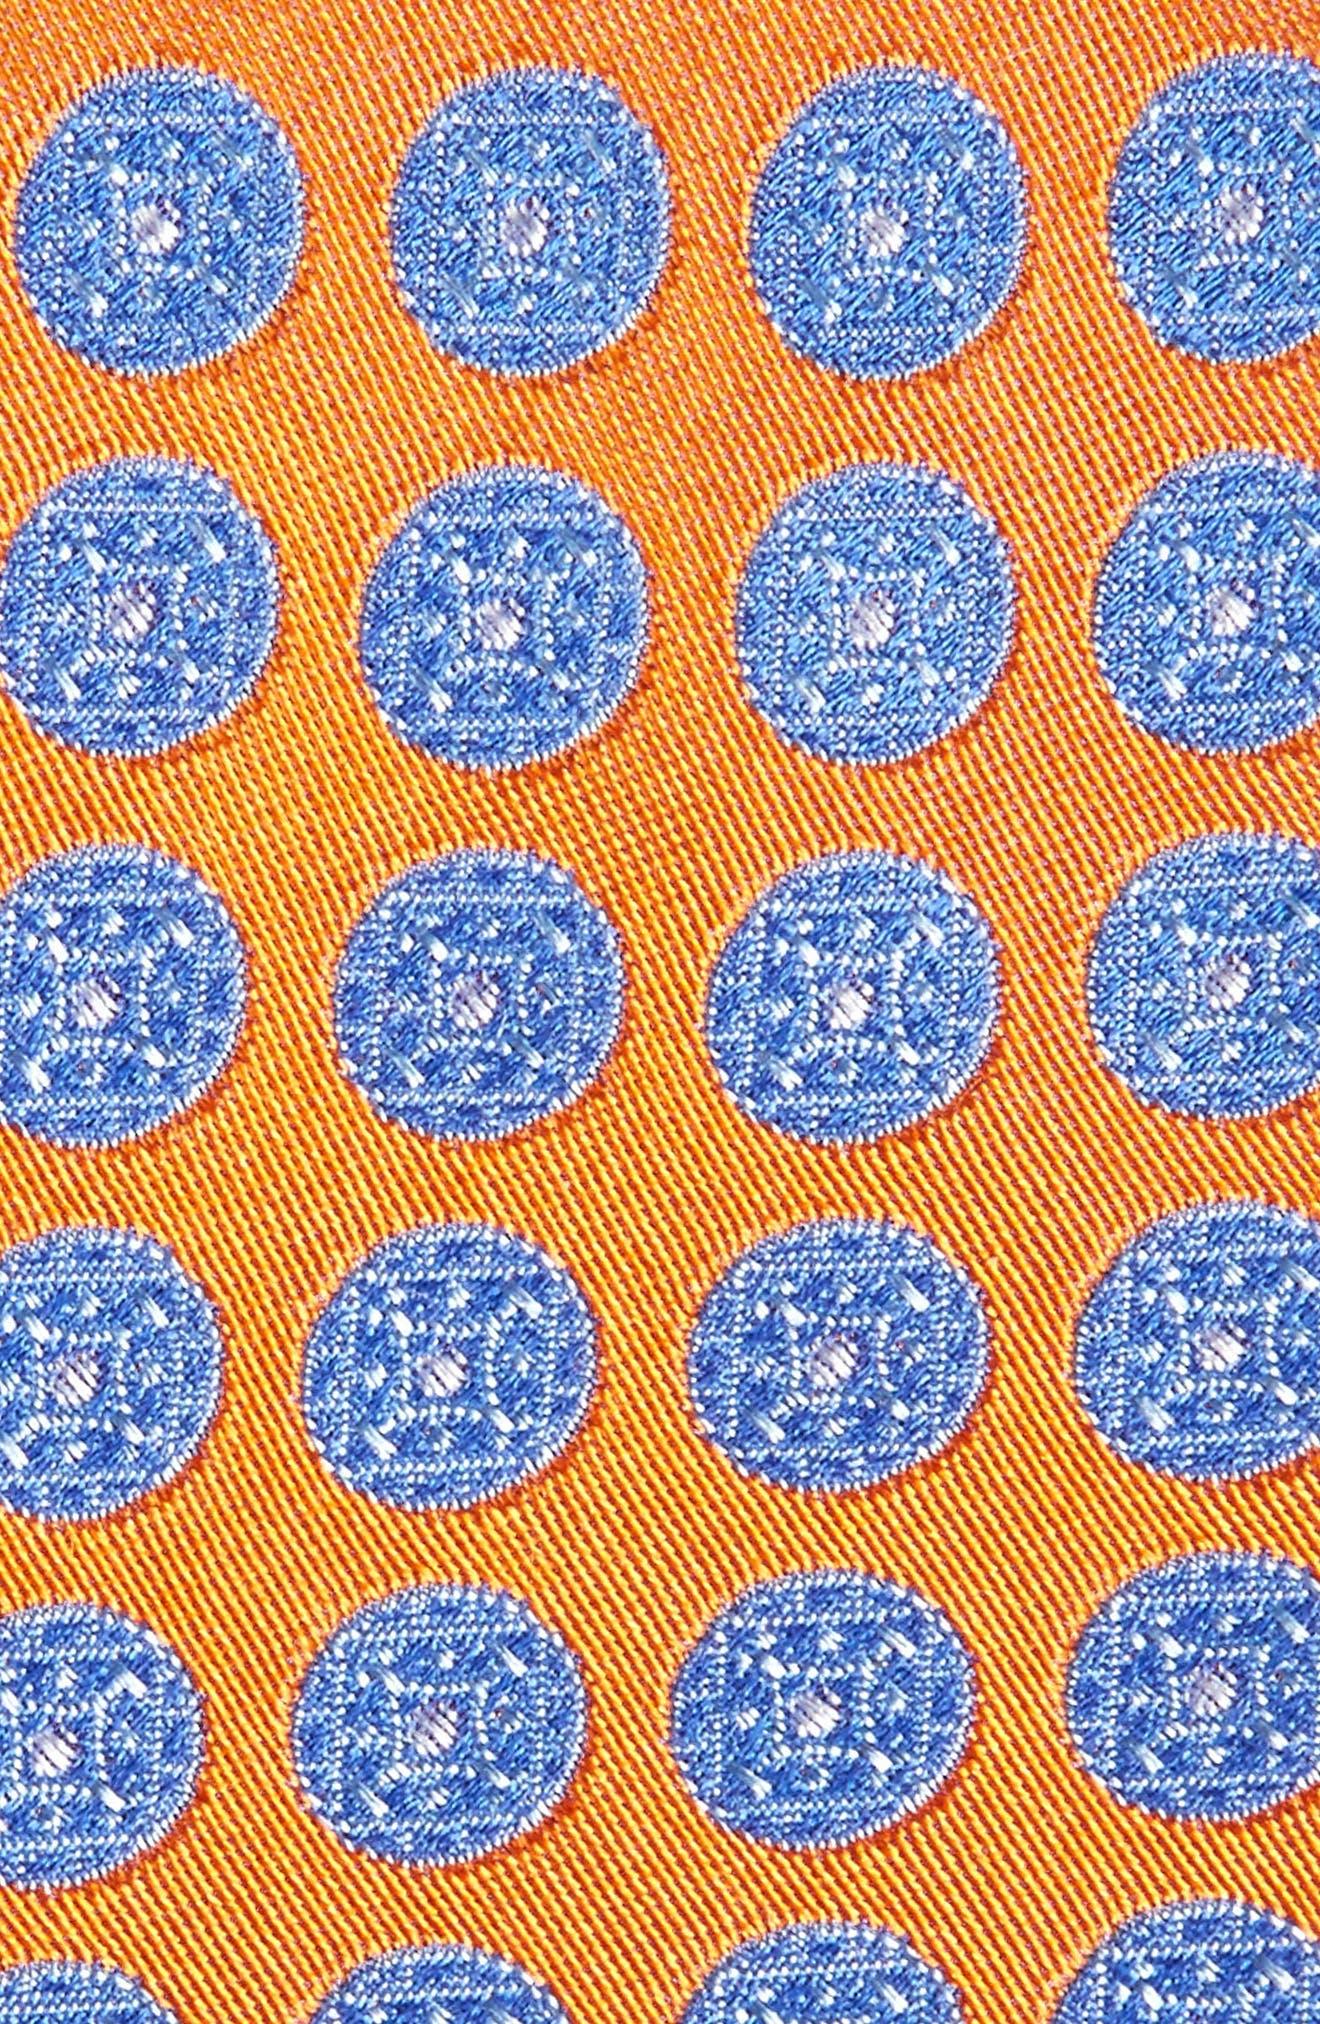 Alternate Image 2  - Nordstrom Men's Shop Carlos Medallion Silk Tie (X-Long)